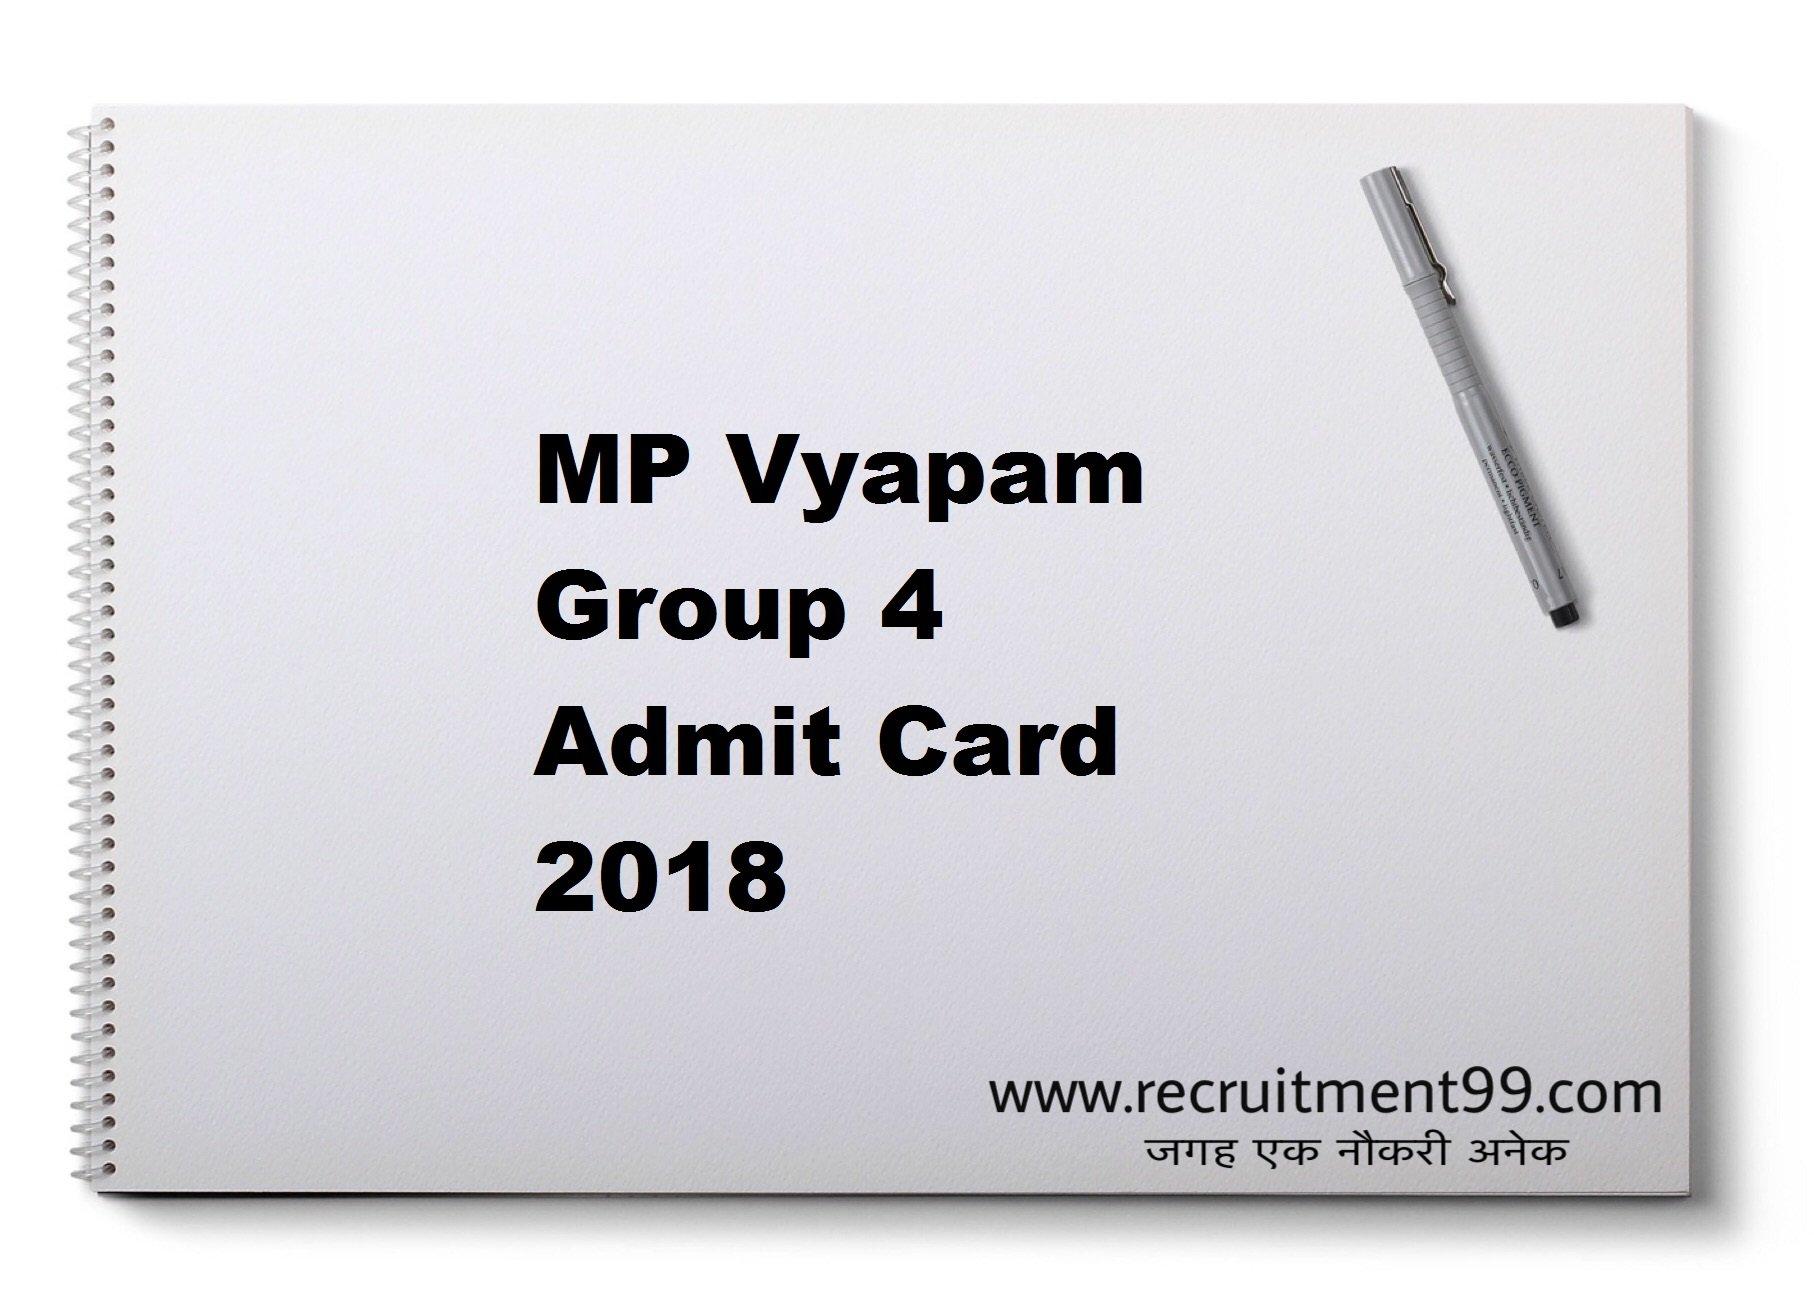 MP Vyapam Group 4 Admit Card 2018